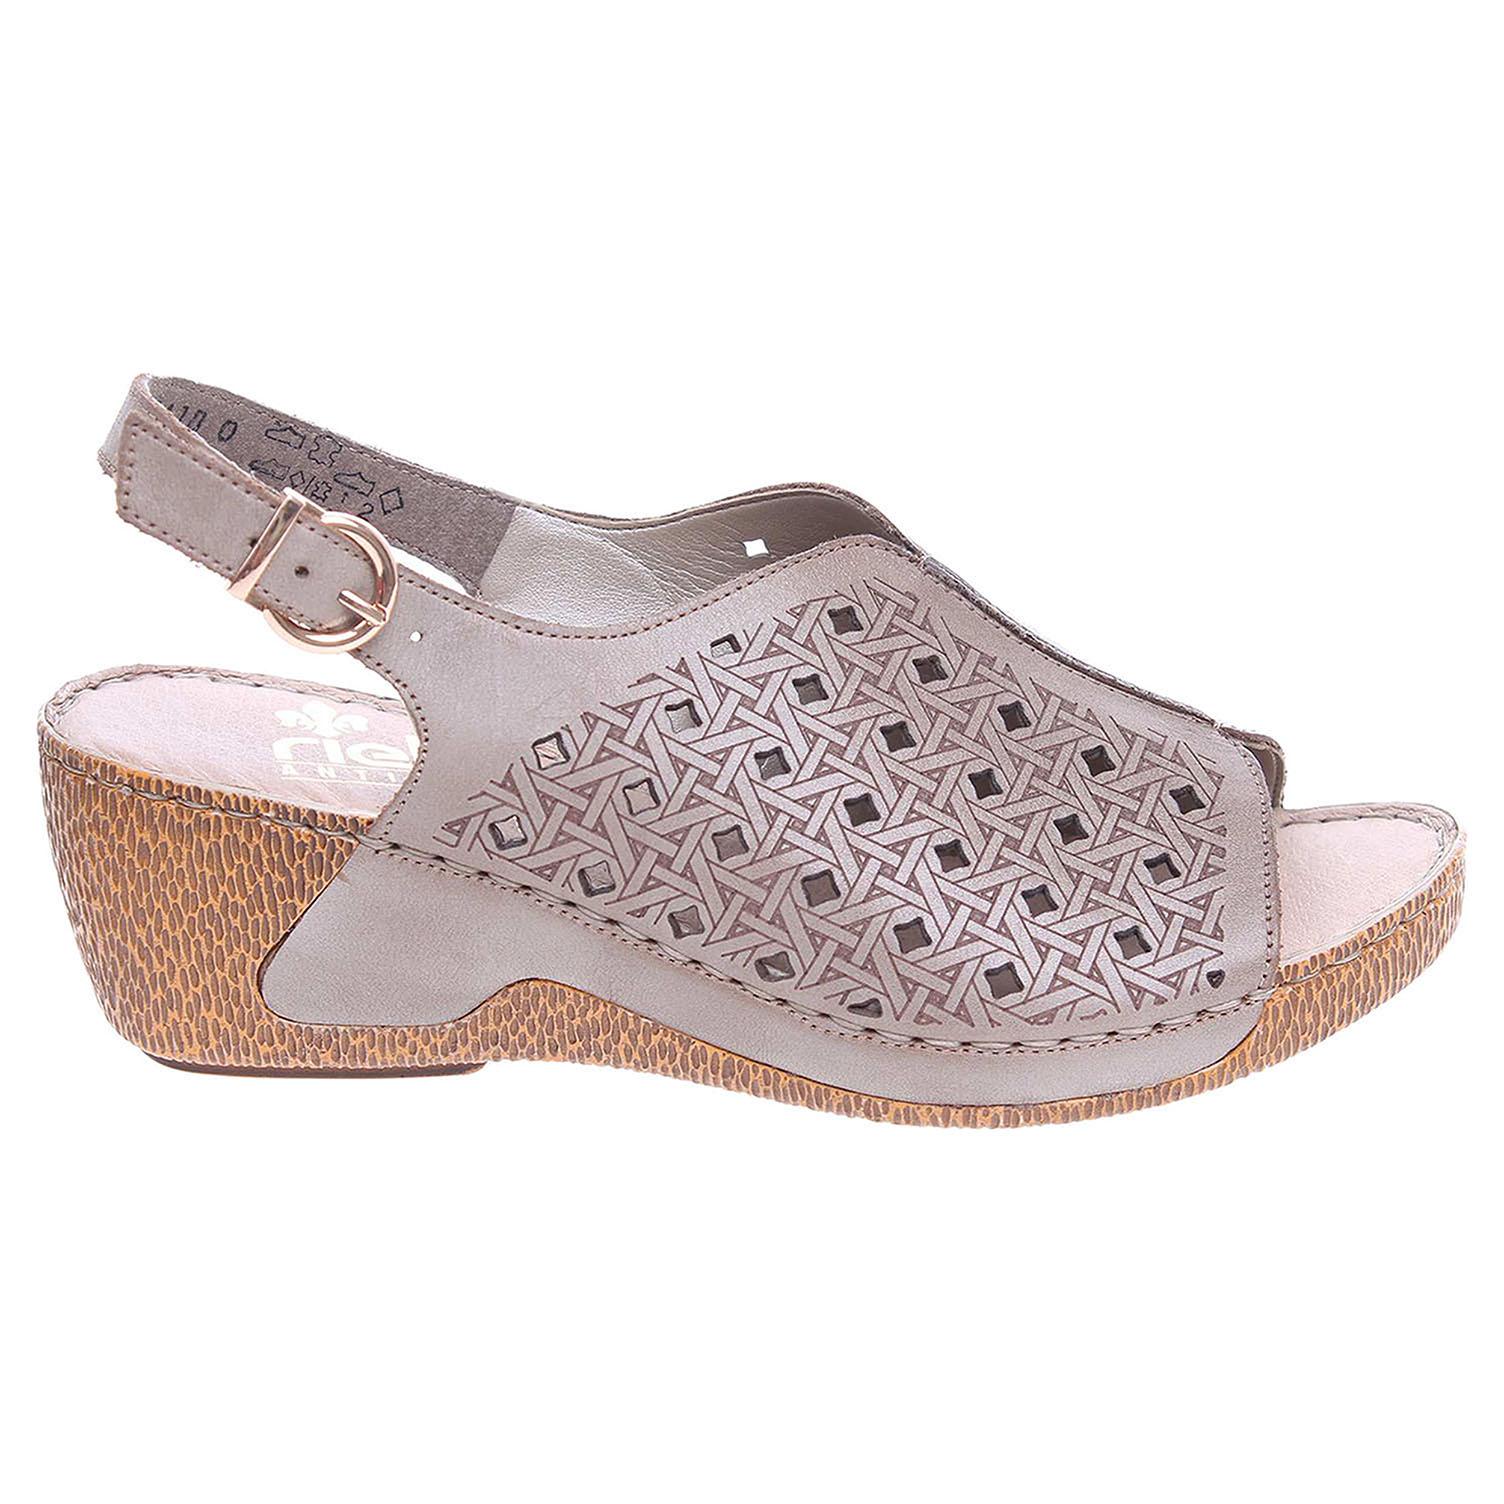 Rieker dámské sandály 65696-62 béžové 37